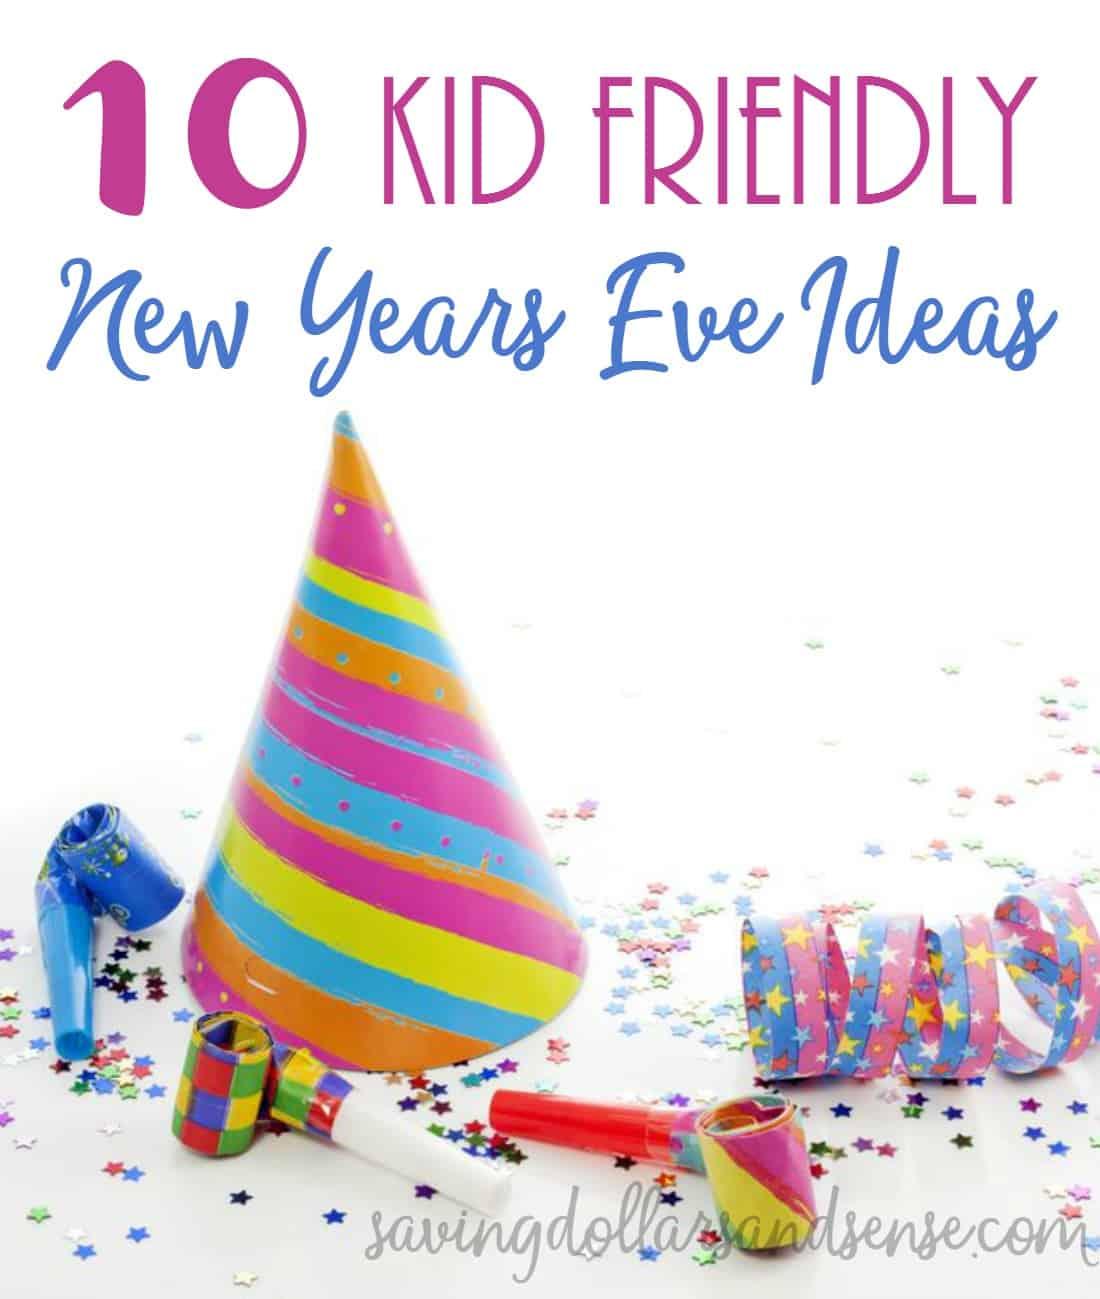 10 Kid-Friendly New Year's Eve Ideas